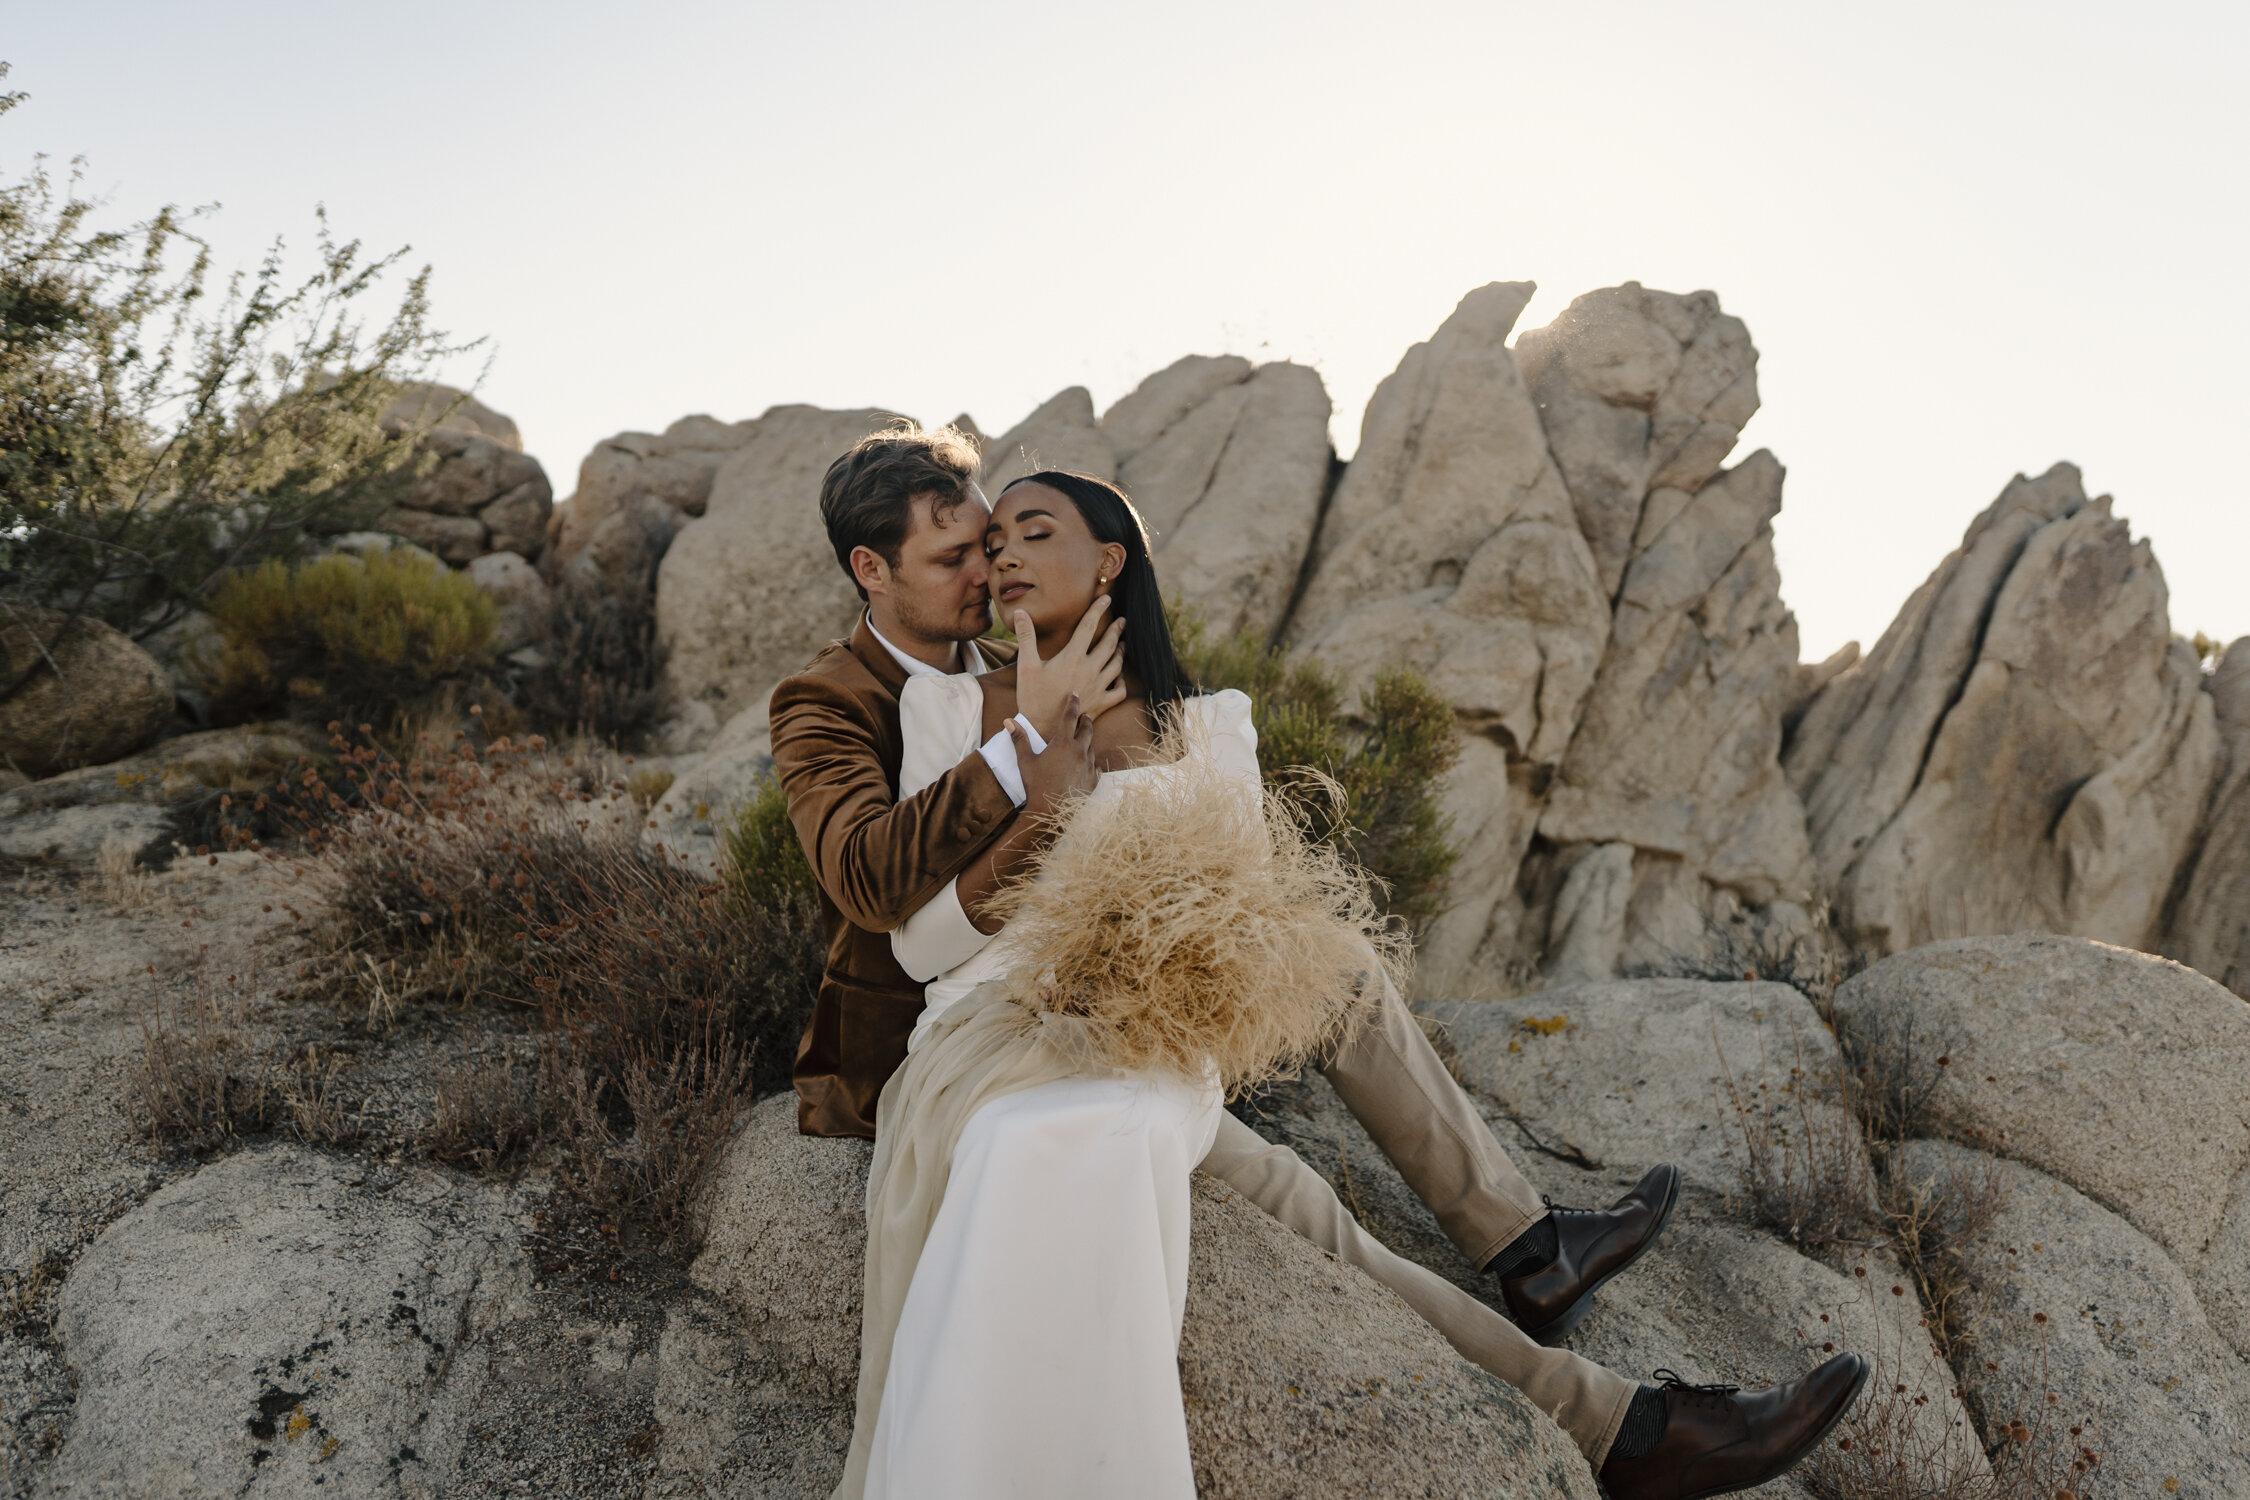 Intimate Elopement Portraits in Joshua Tree by Kayli LaFon Photography